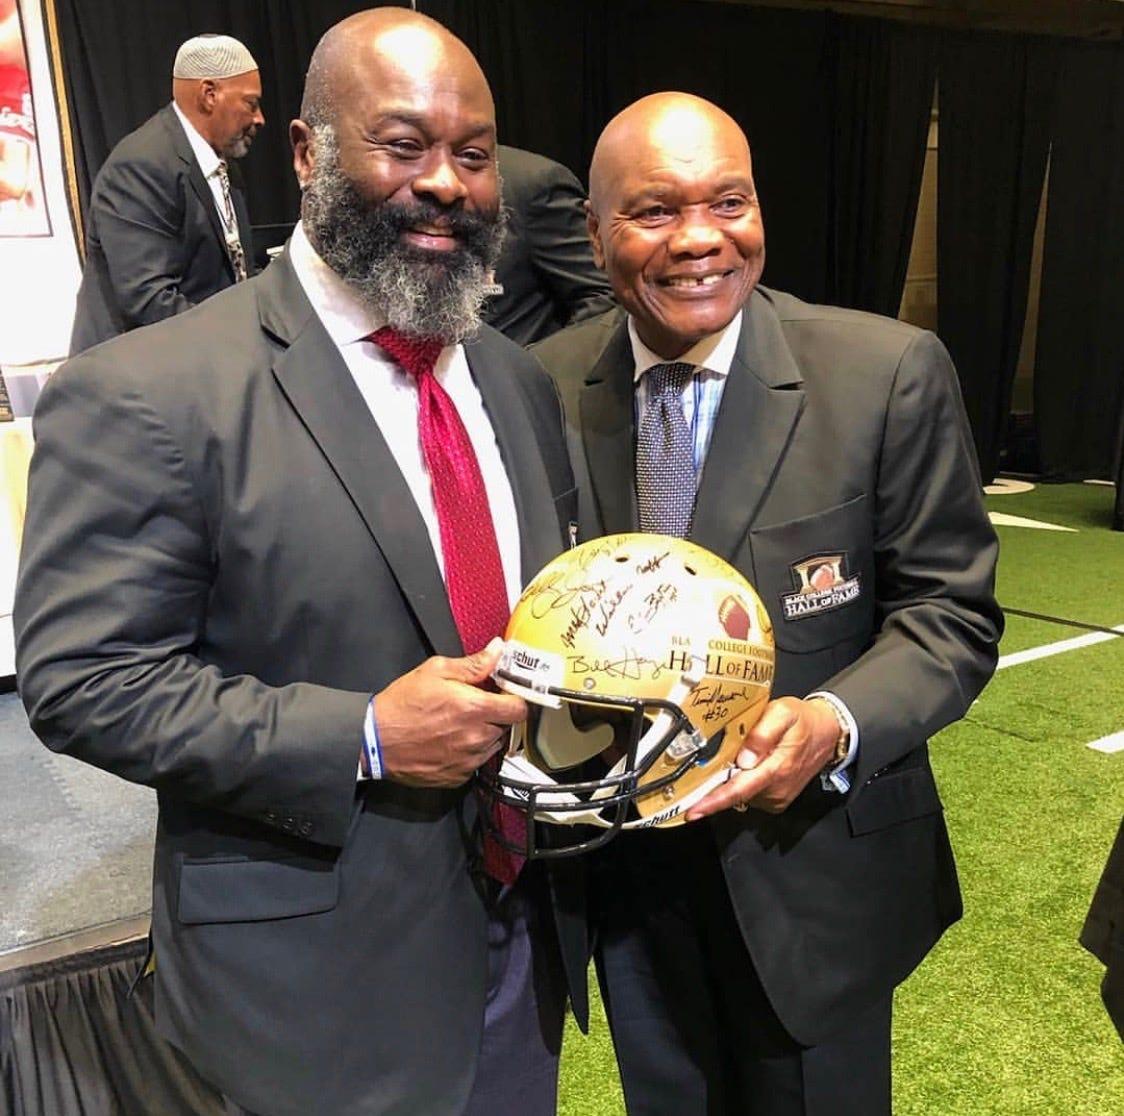 Huge honor for Hugh: Ex-Tyger elected to Black College Football HOF